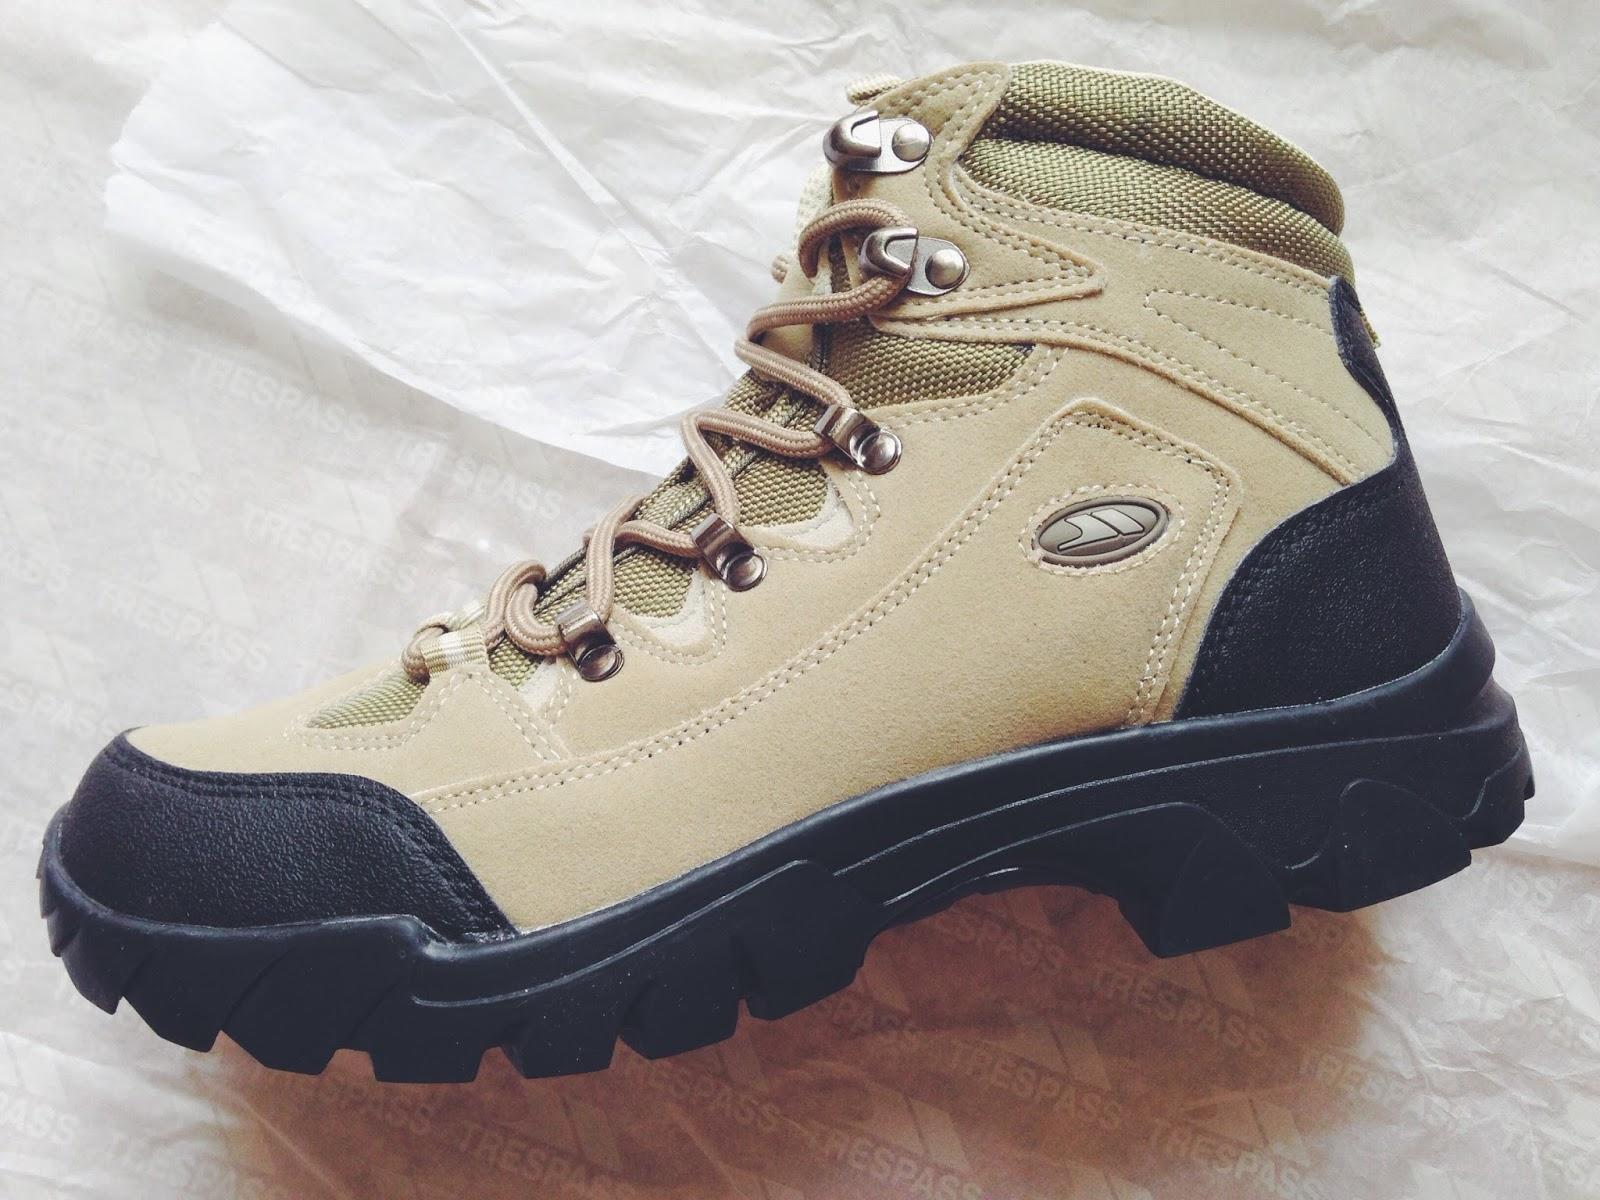 15f029927f3 Trespass: Vegan Walking Boots | Curiously Conscious